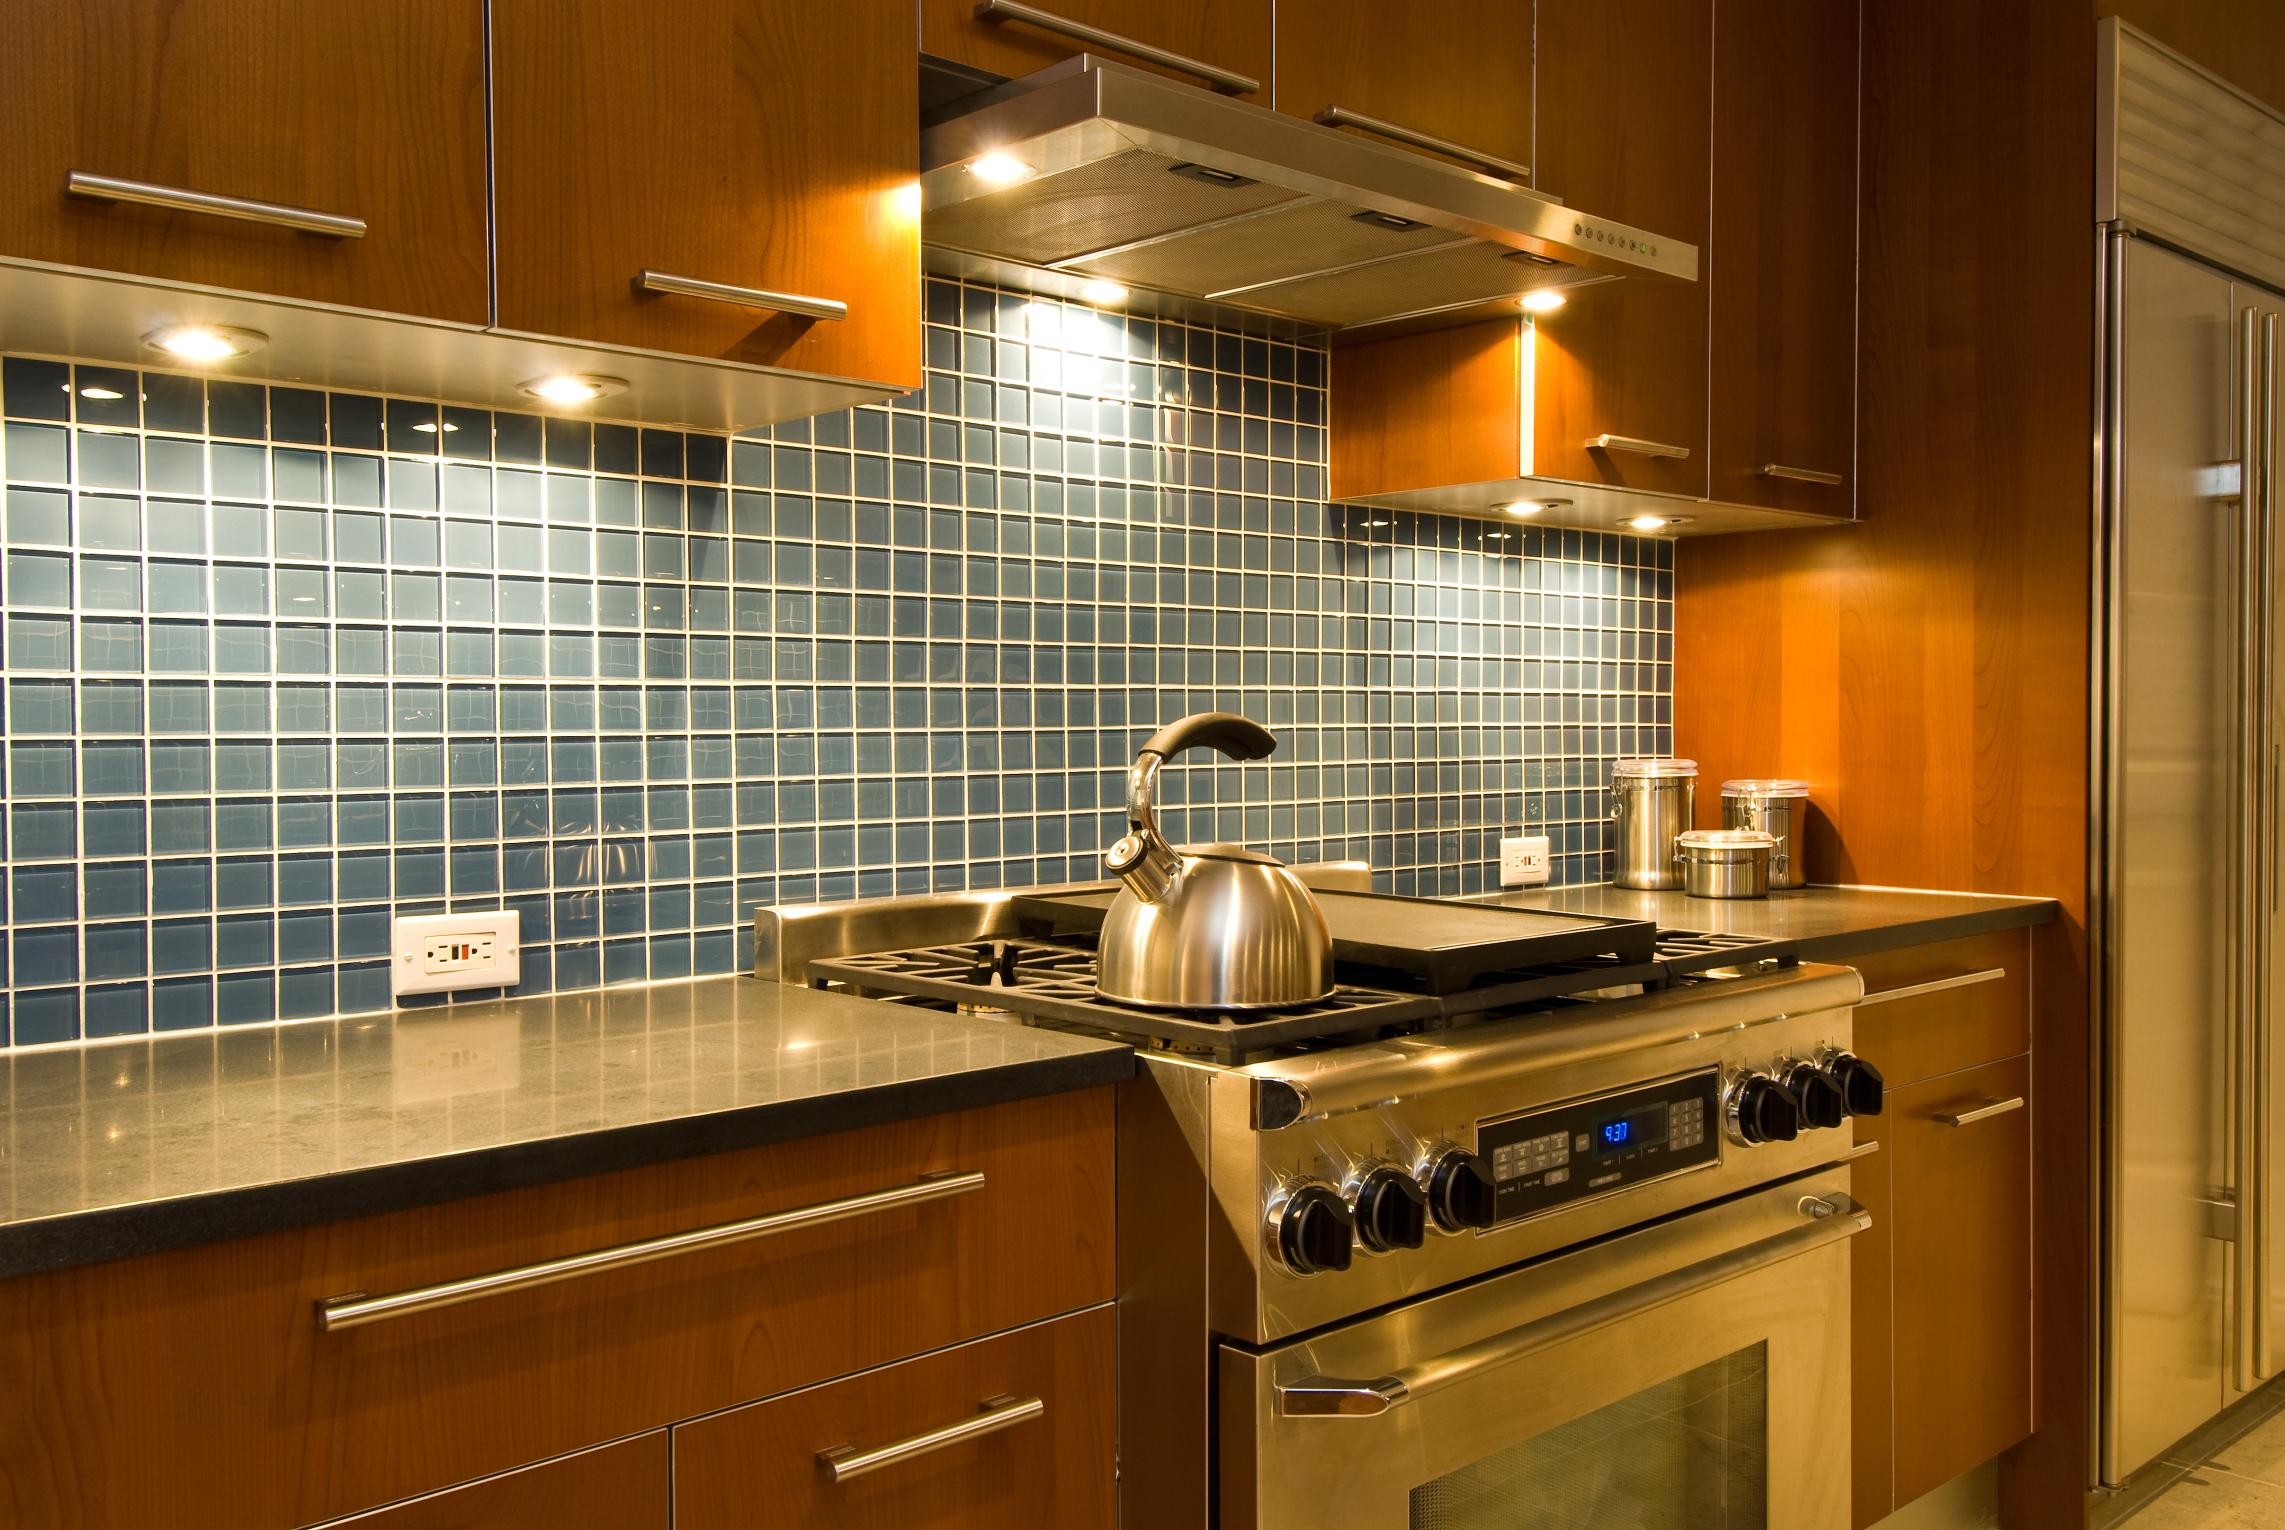 Dise o de cocinas ideas modernas para el coraz n de la for Can you paint over glass tile backsplash